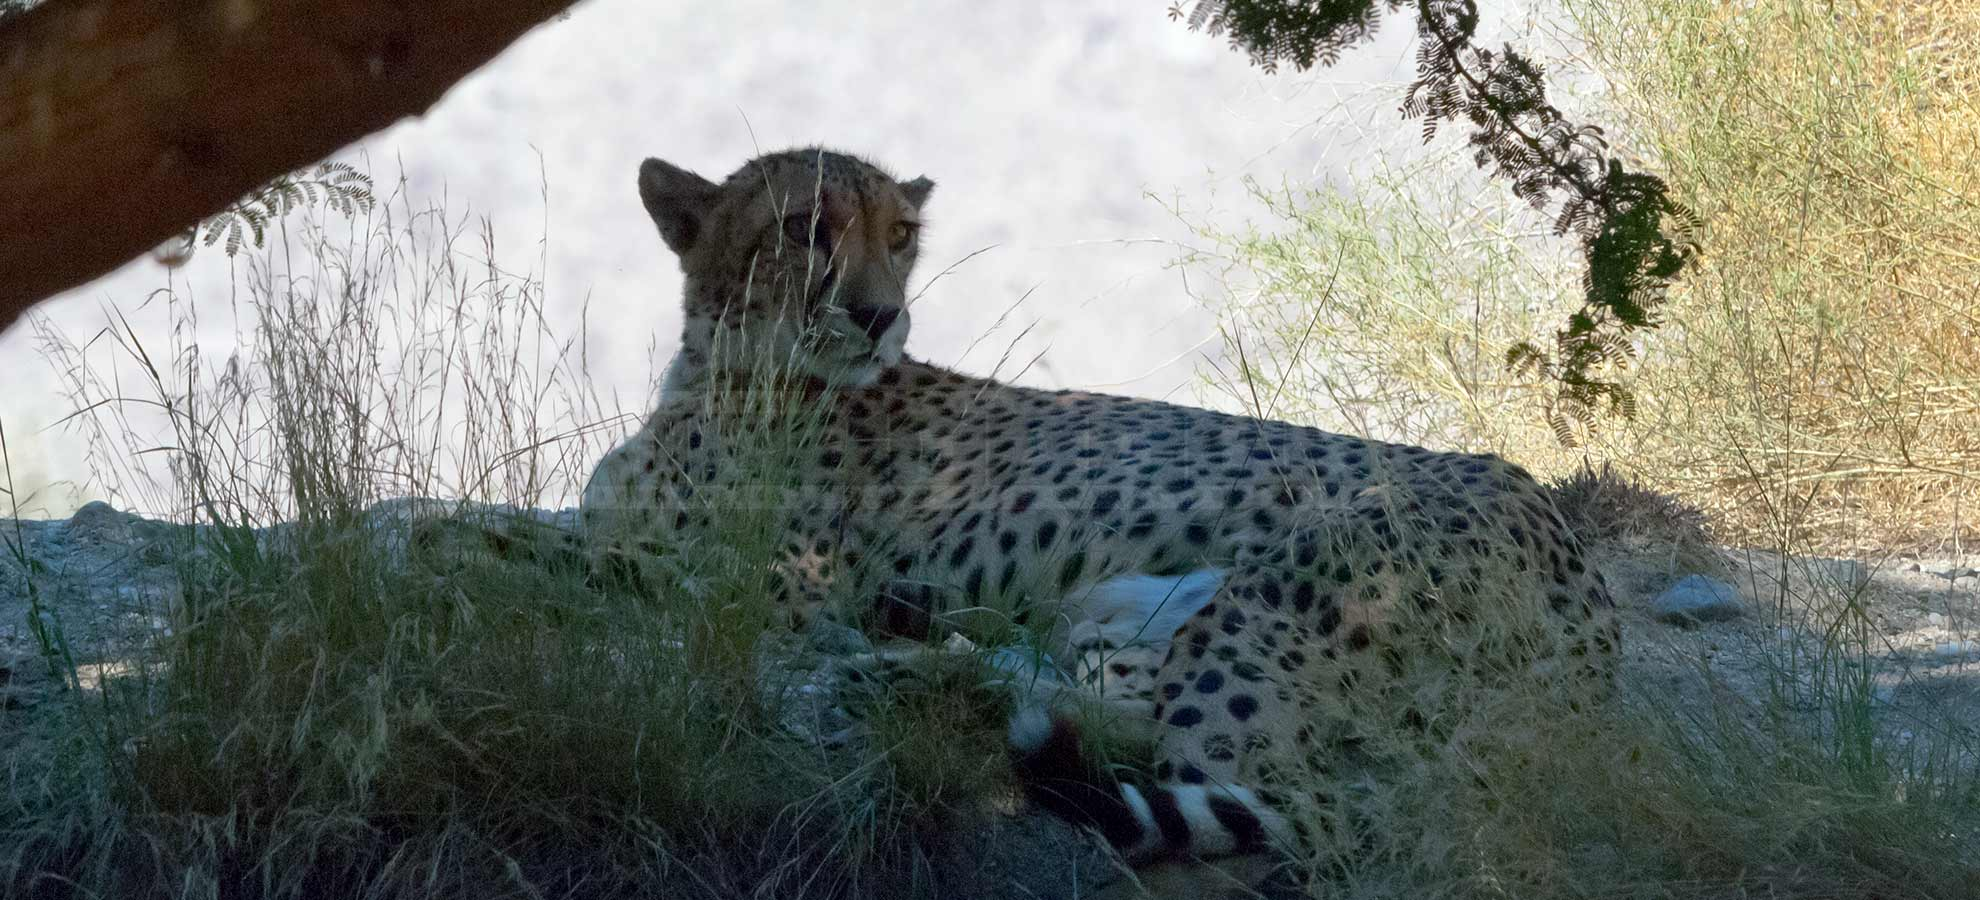 cheetah resting under the mesquite tree